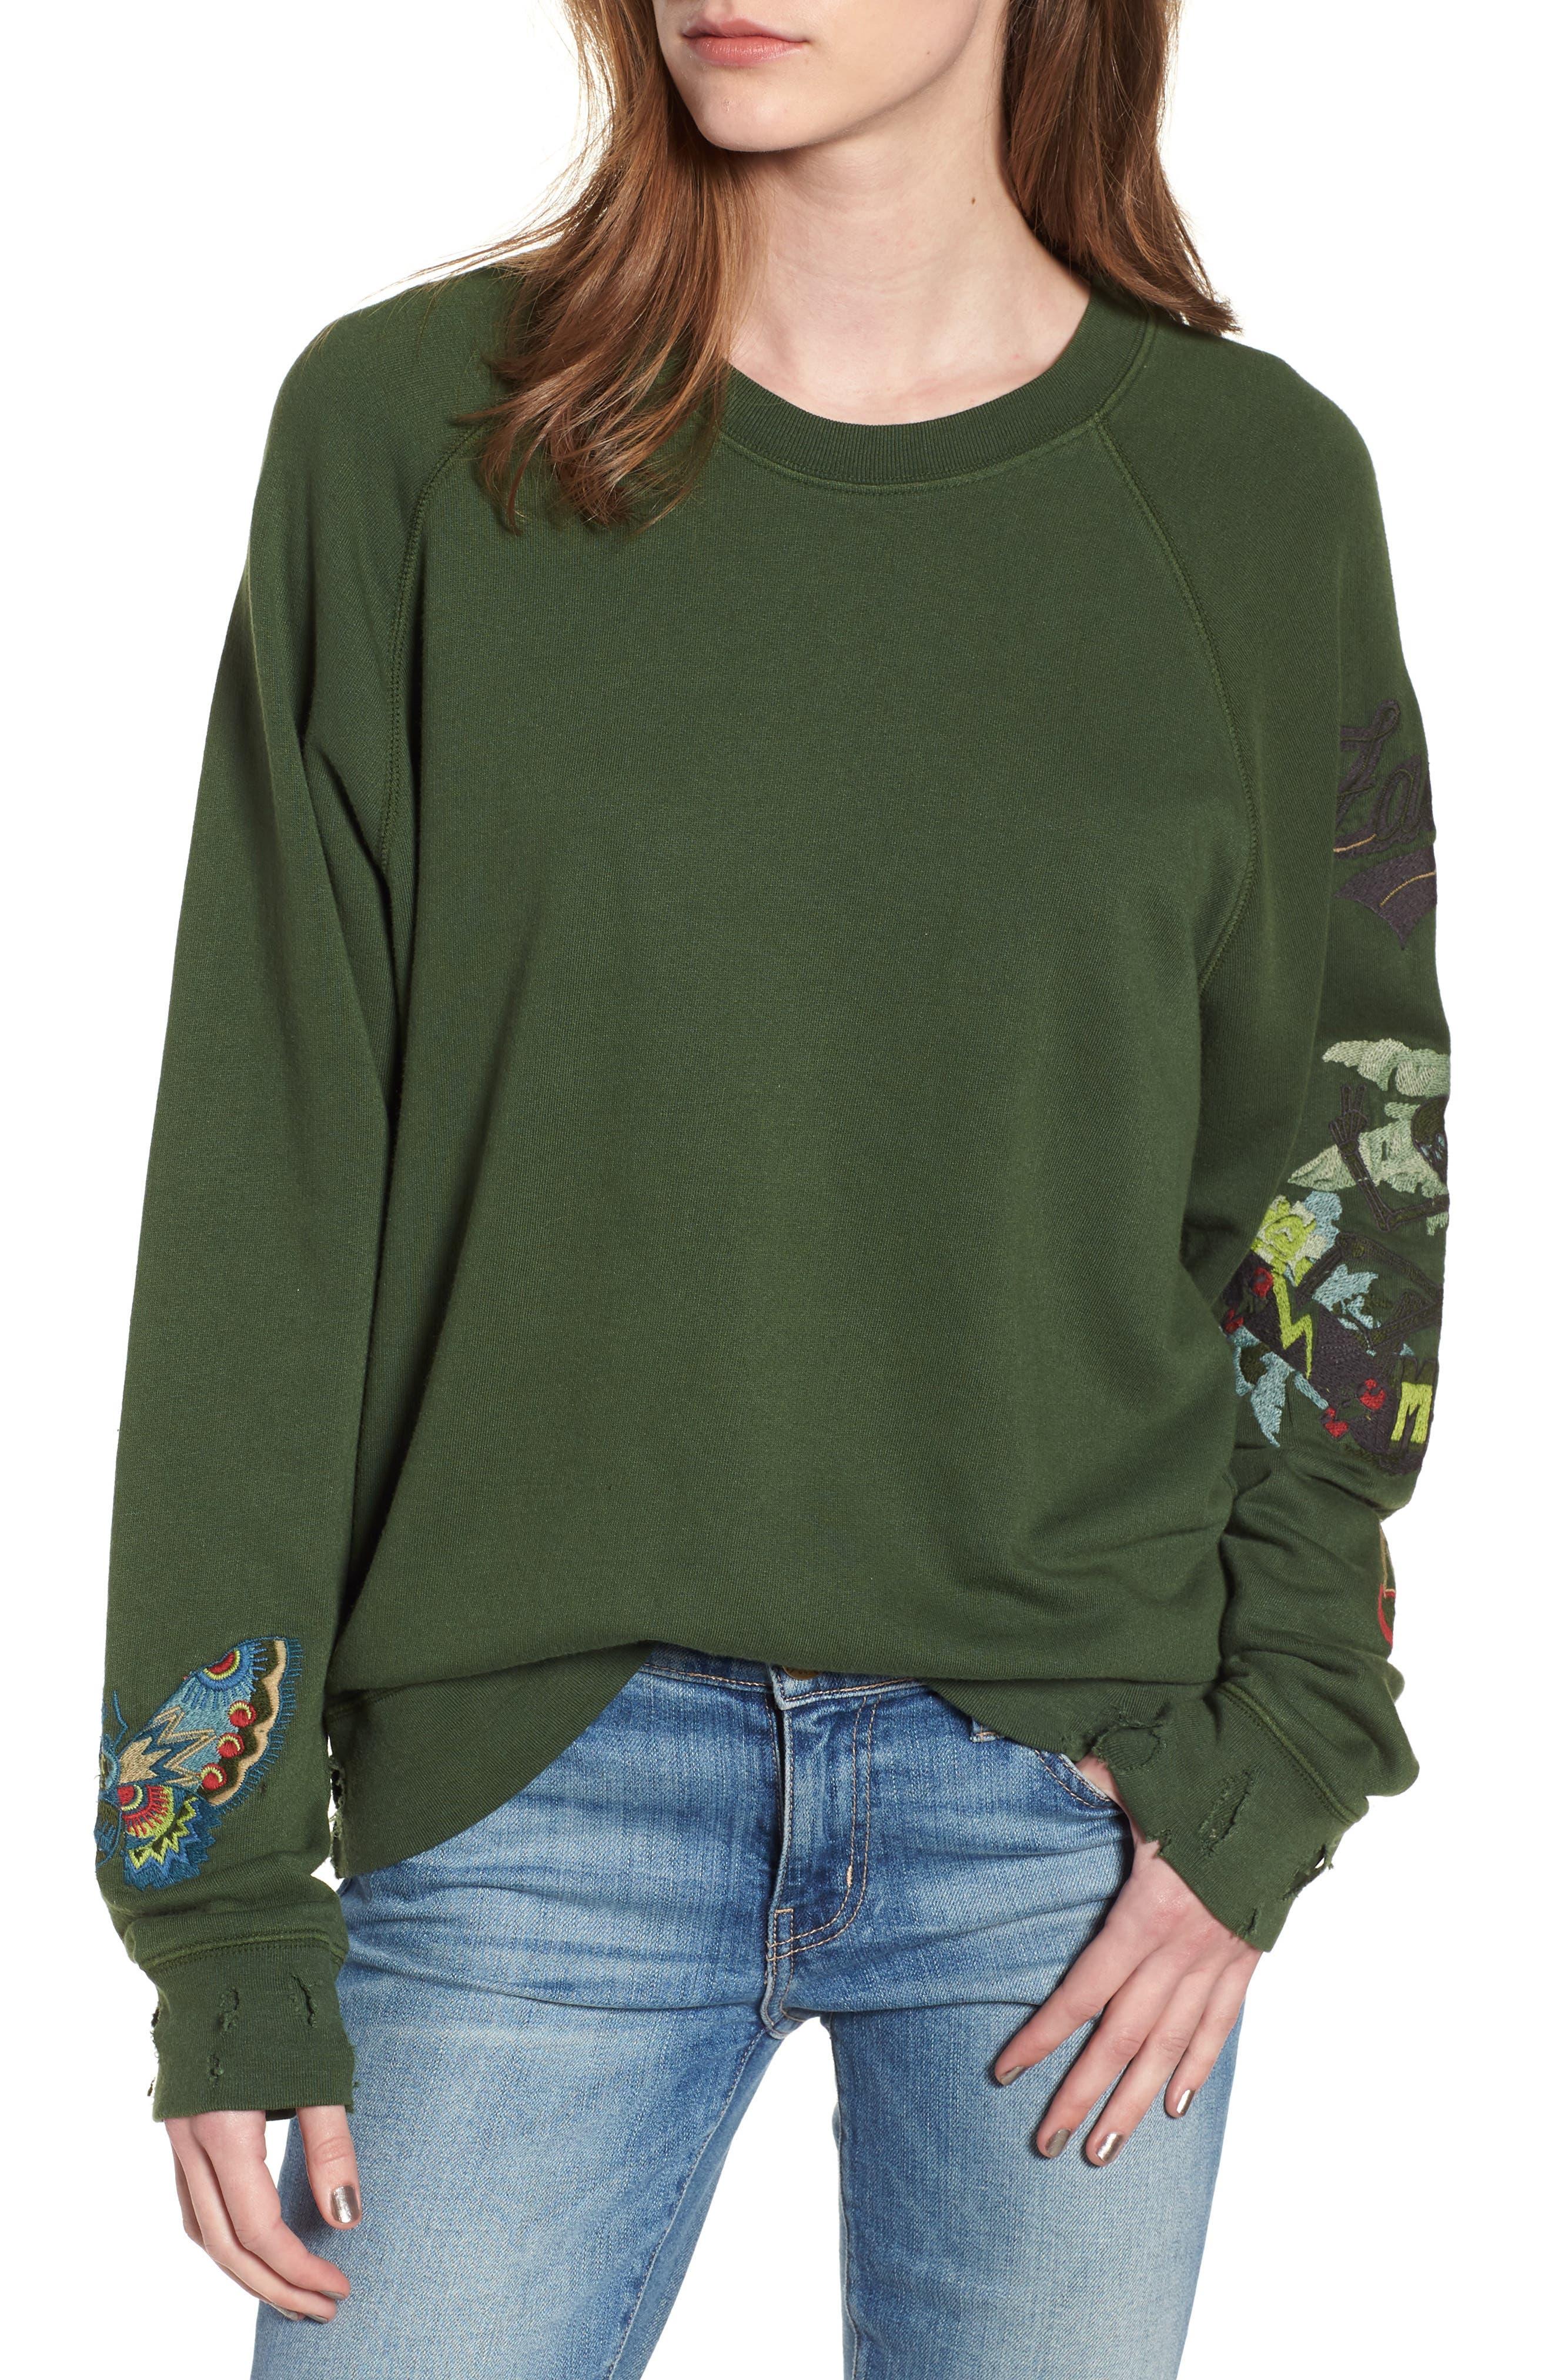 Upper Bis Brode Sweatshirt,                             Main thumbnail 1, color,                             340